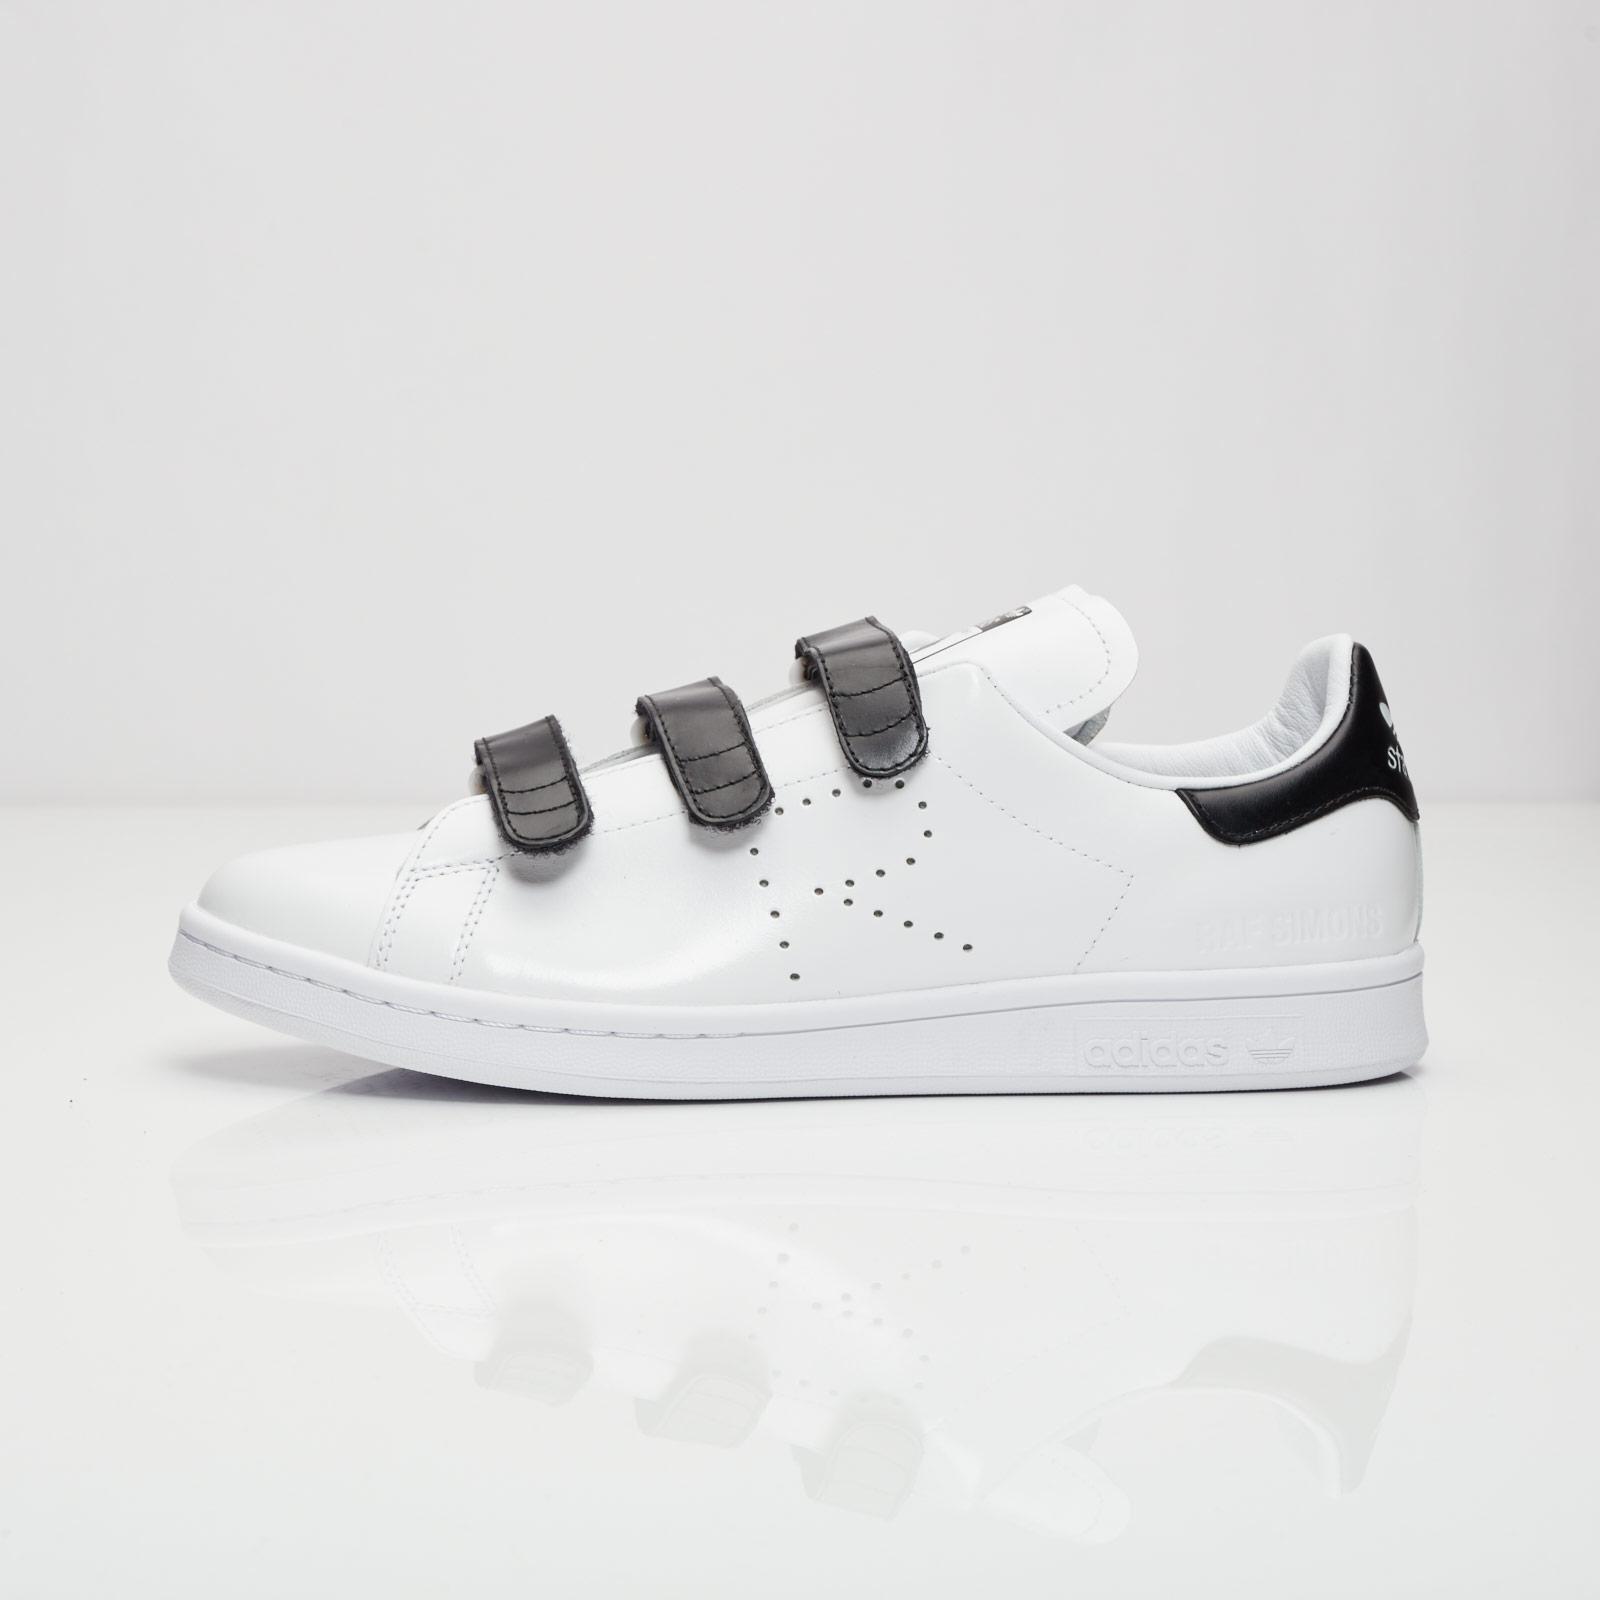 Adidas raf simons stan smith conforto bb2682 scarpe da ginnasticanstuff